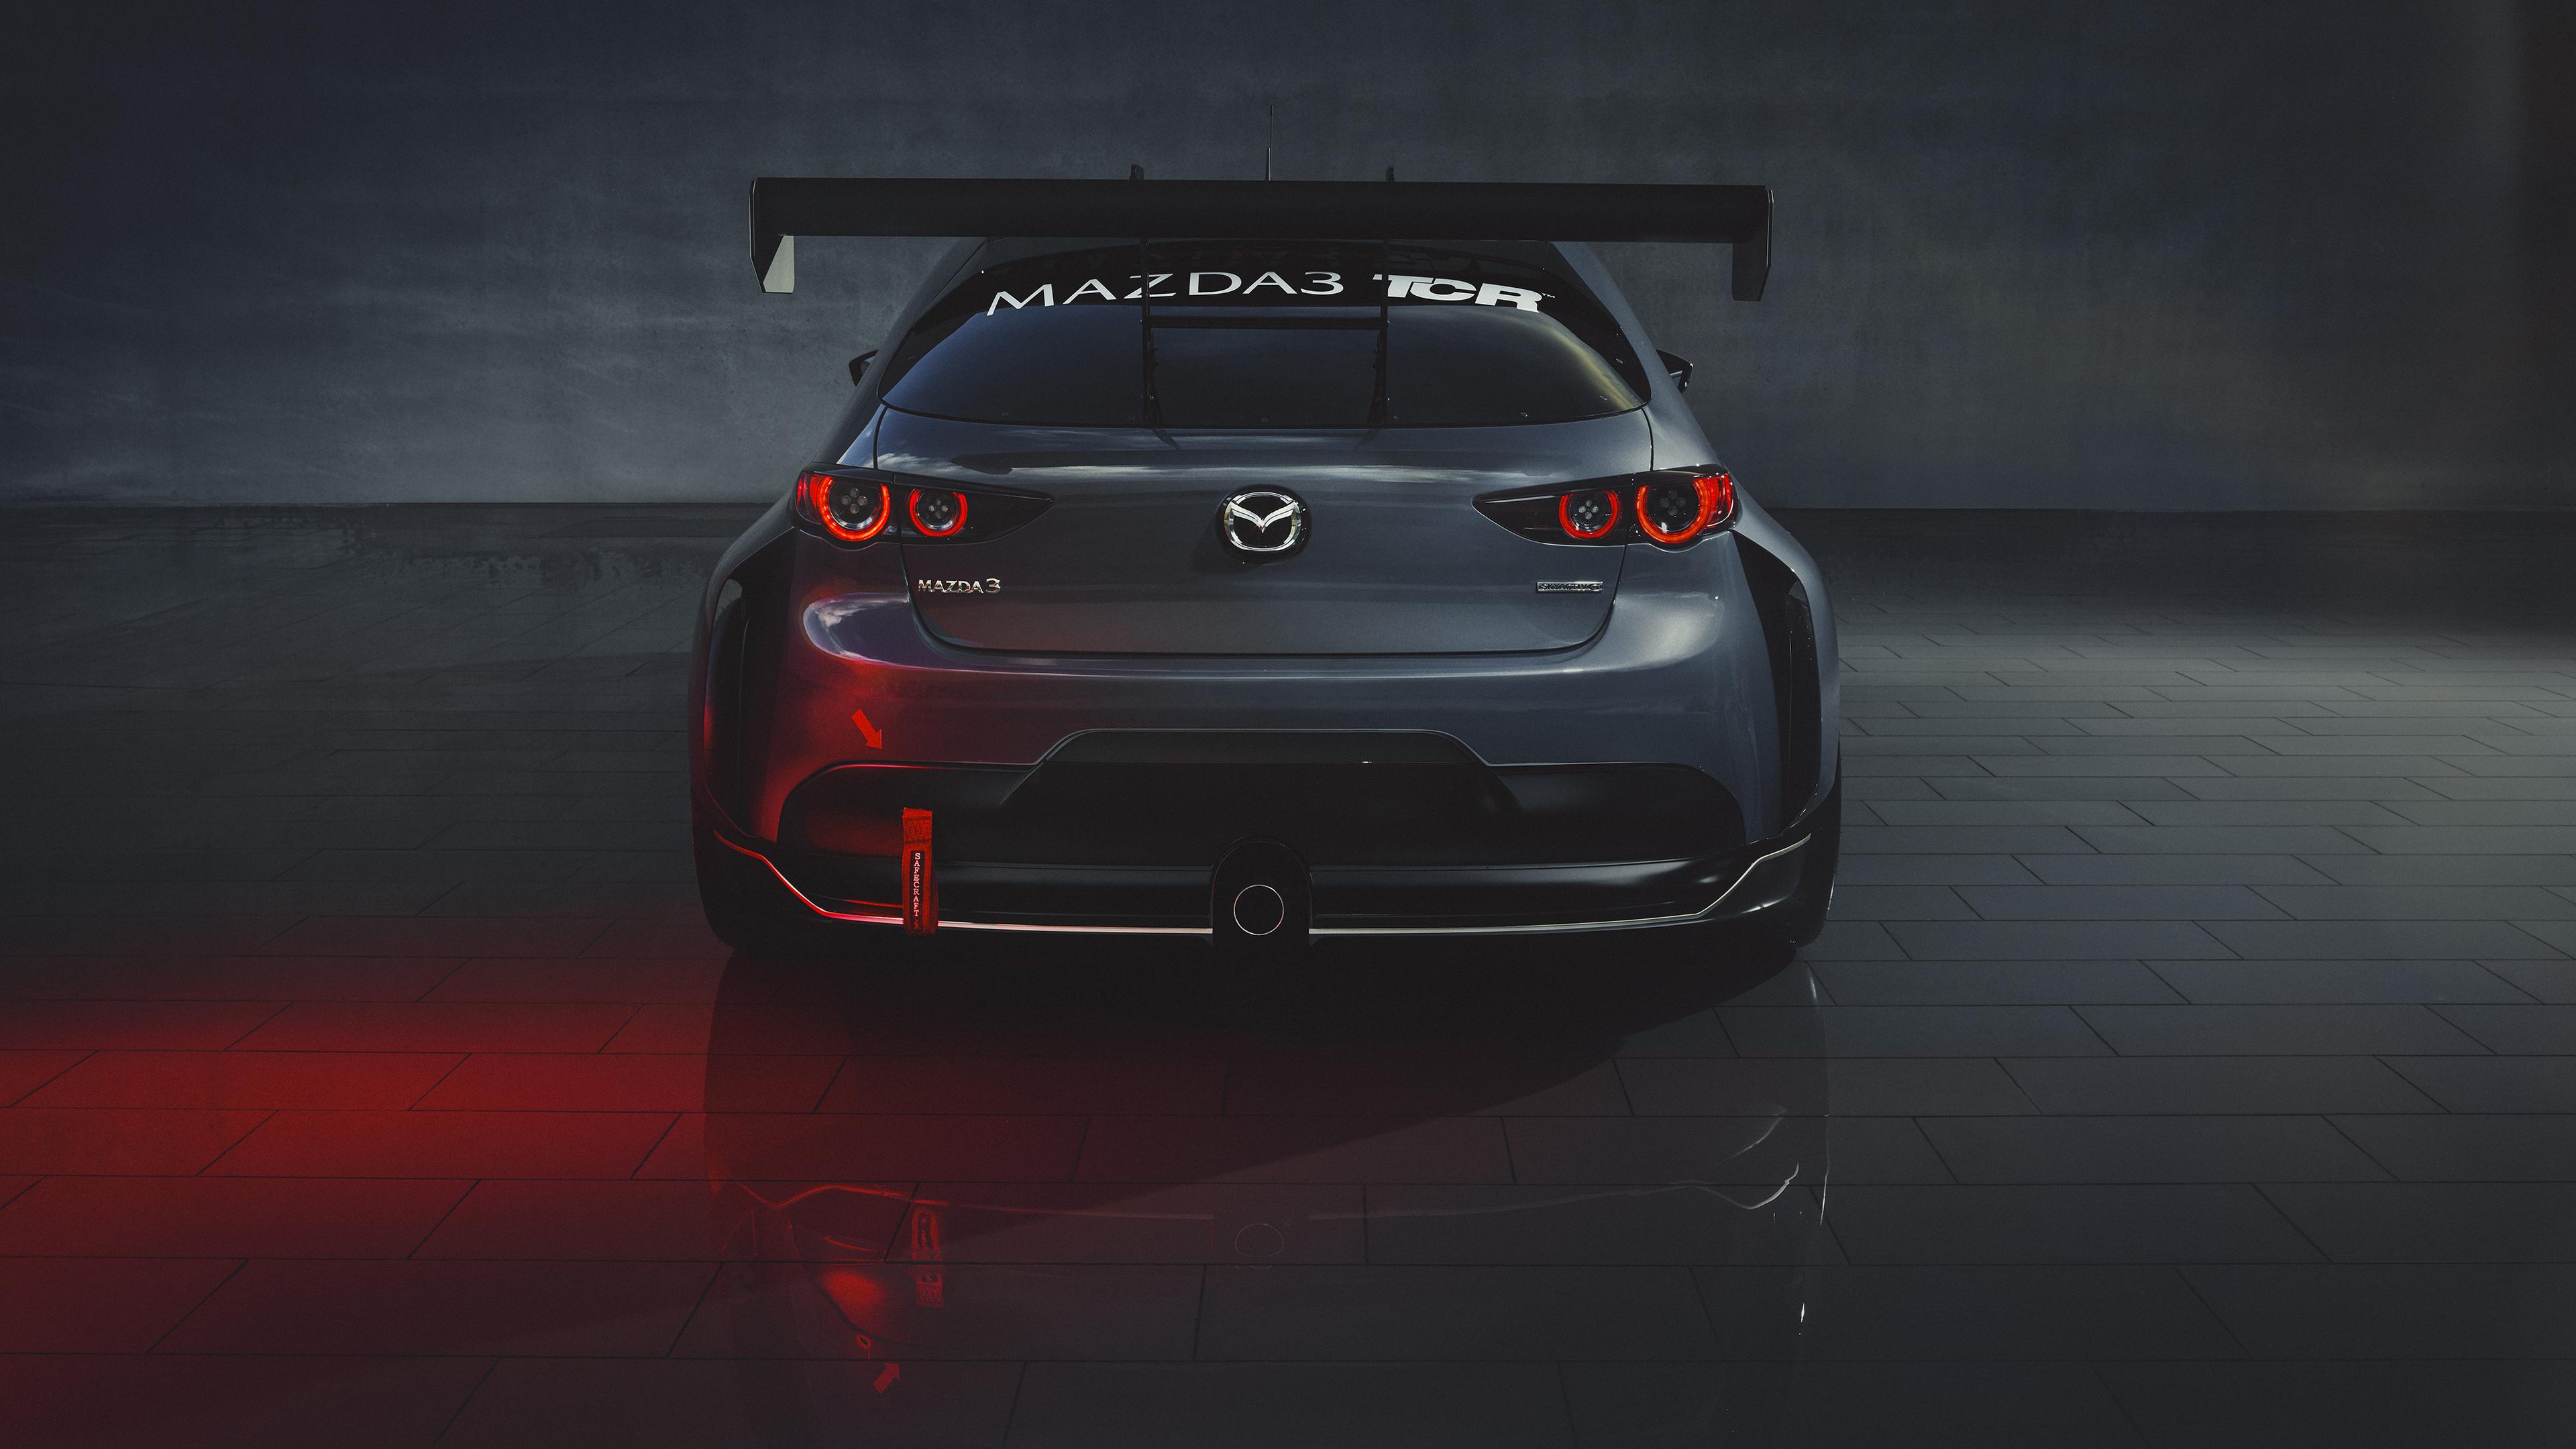 mazda 3 tcr 2020 1570919254 - Mazda 3 Tcr 2020 - mazda wallpapers, hd-wallpapers, cars wallpapers, 4k-wallpapers, 2020 cars wallpapers